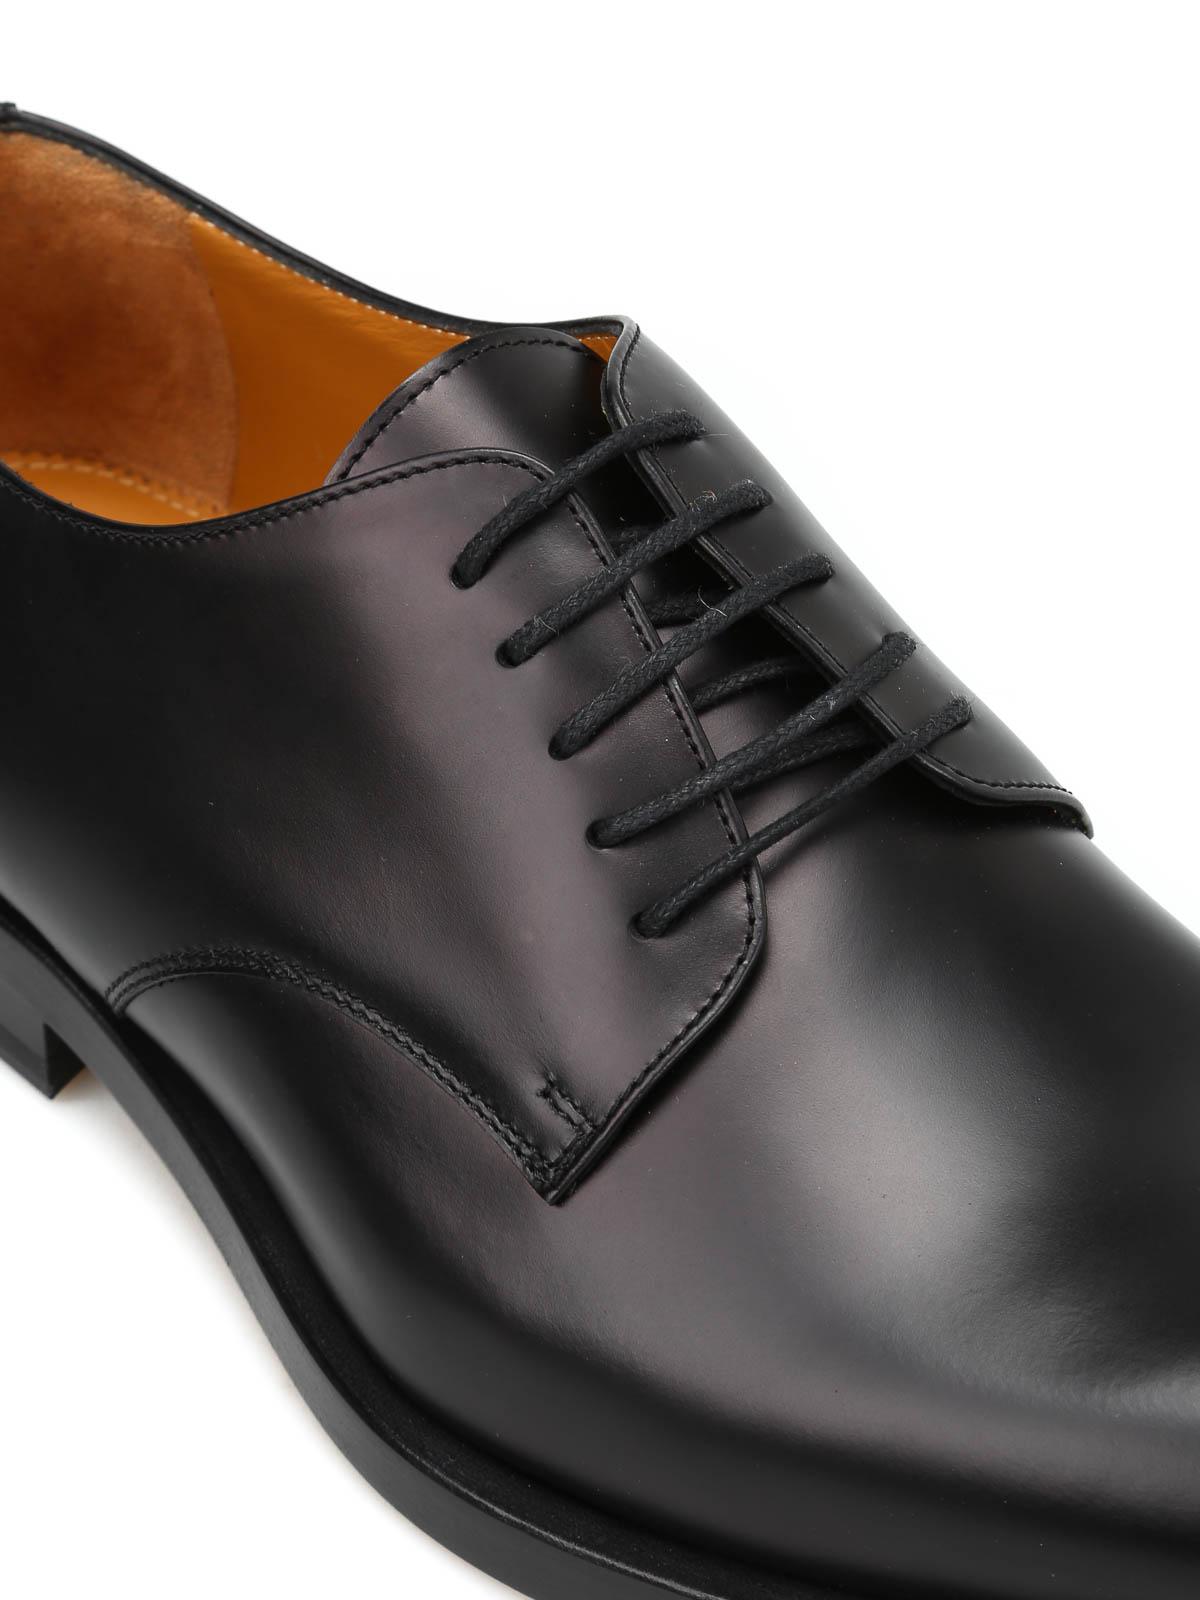 a56a3ef9b4f iKRIX VALENTINO  Chaussures classiques - Chaussures Noir Pour Homme